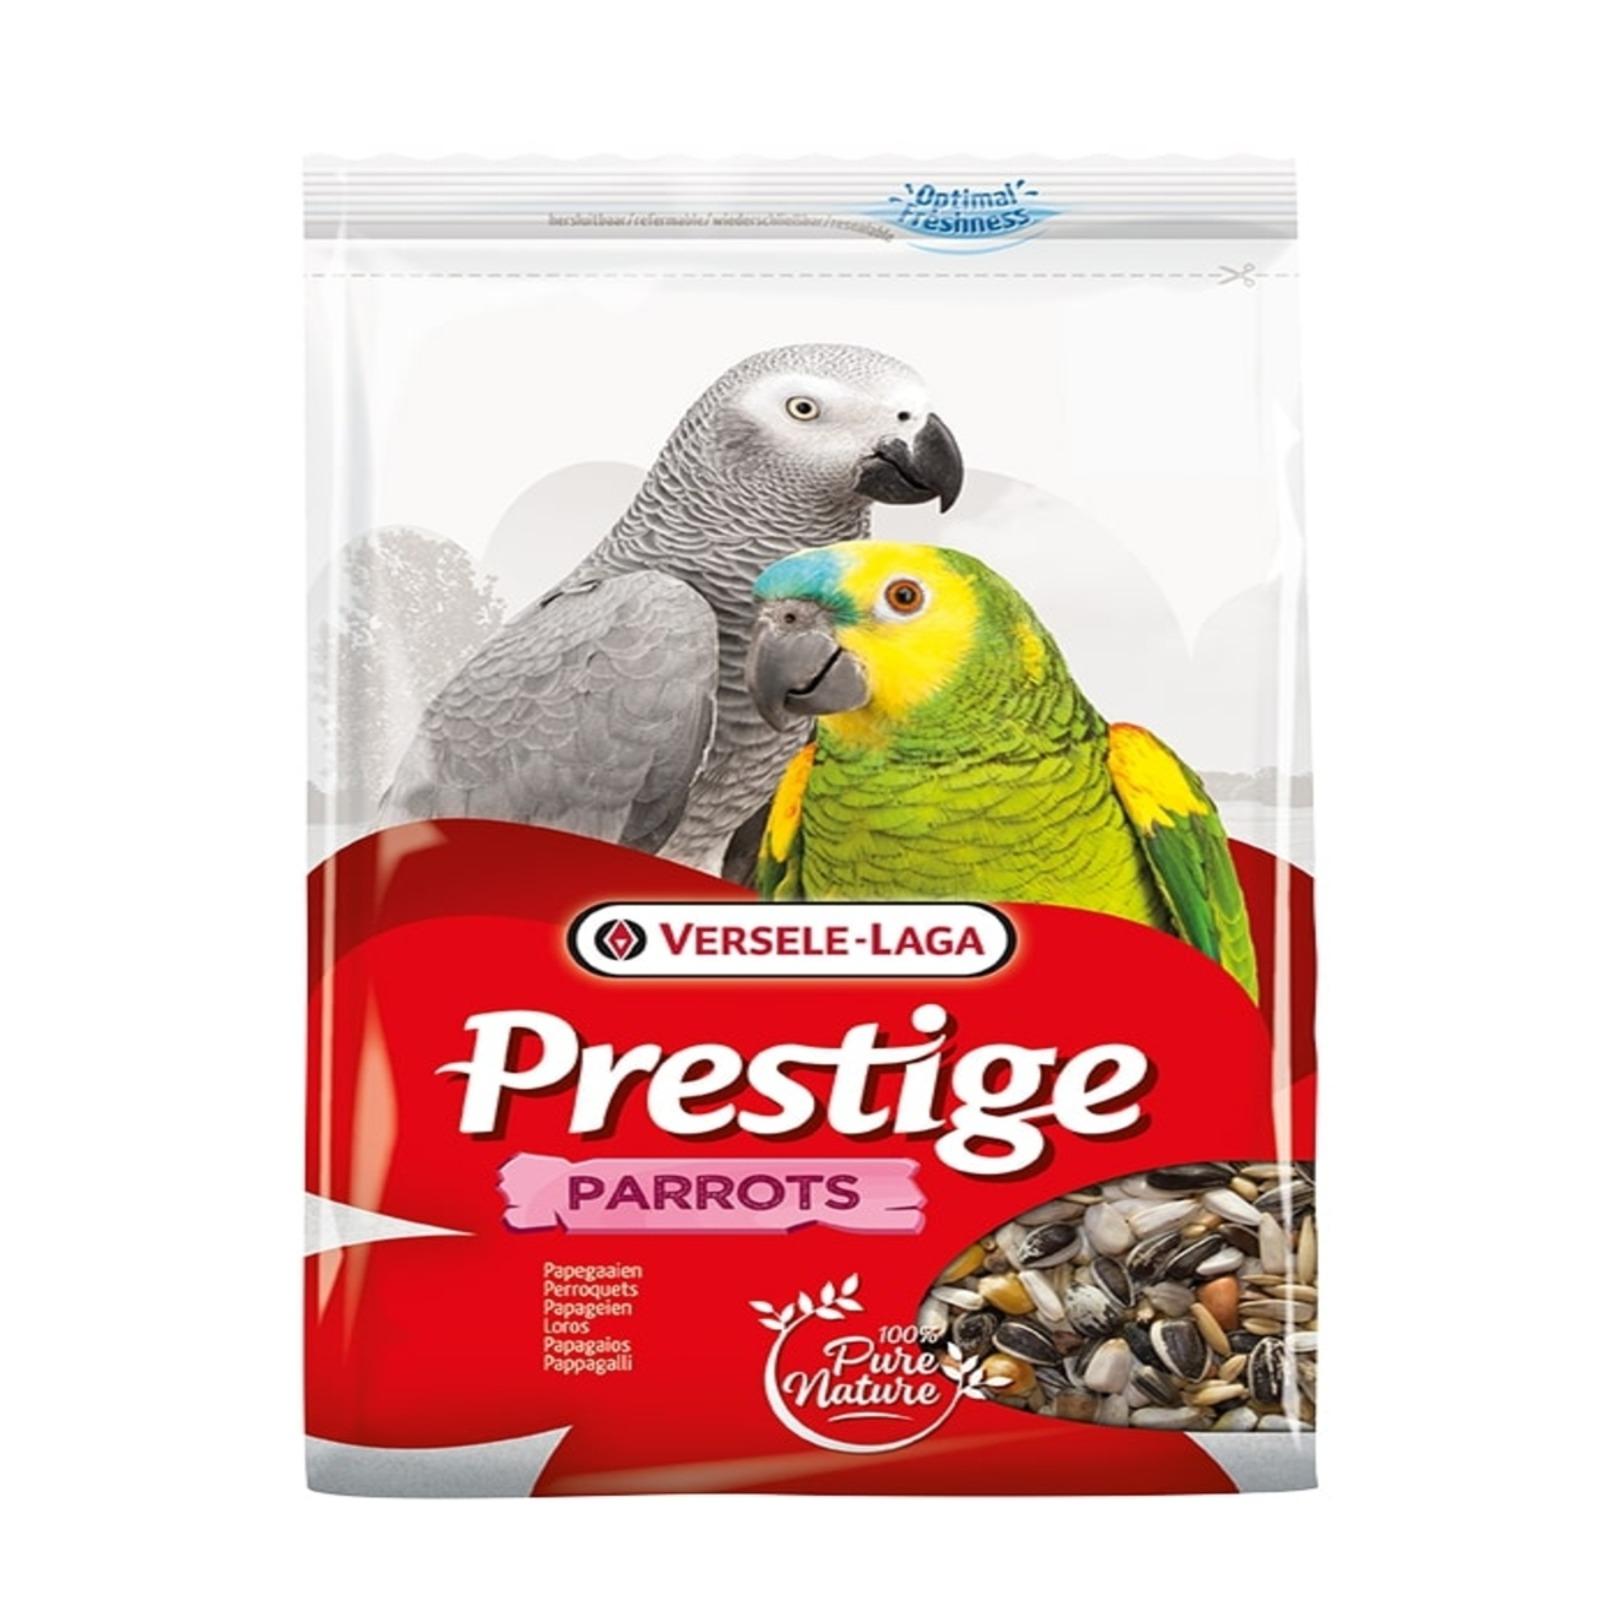 Versele Laga Prestige Parrots